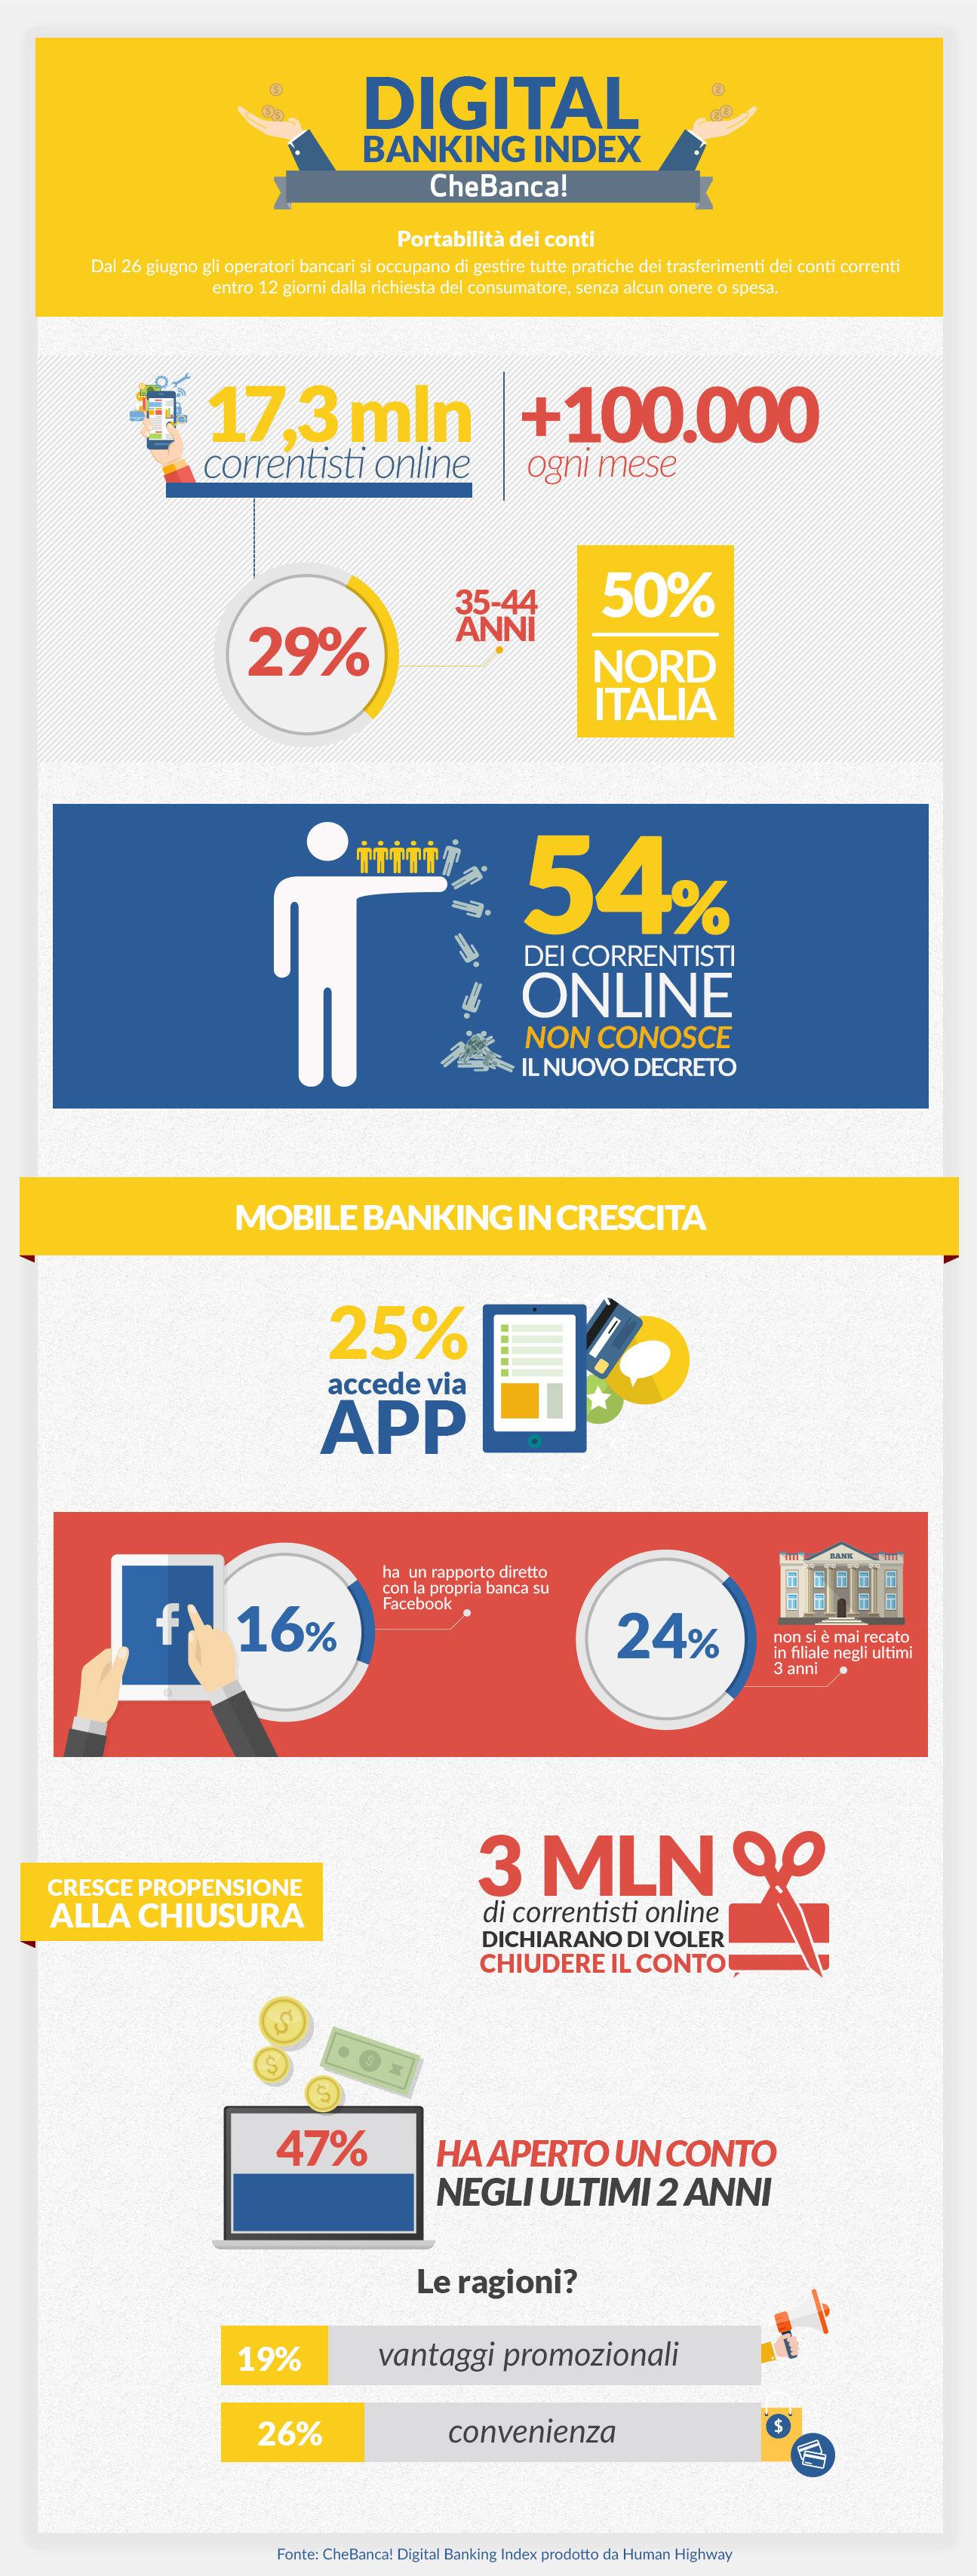 Infografica CheBanca! Digital Index